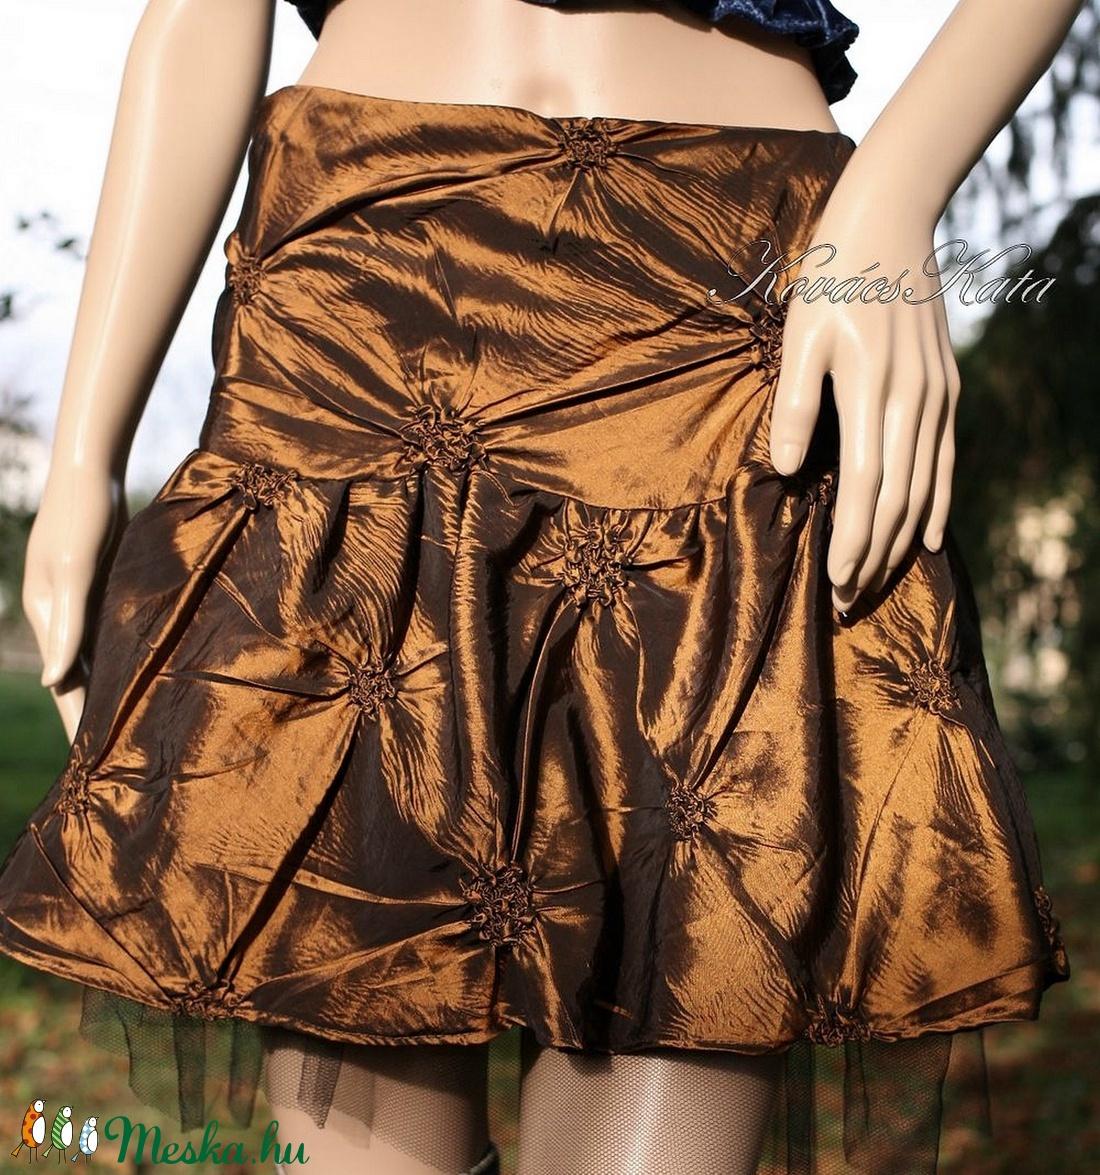 TAFT MINI - alkalmi design szoknya - ruha & divat - női ruha - alkalmi ruha & estélyi ruha - Meska.hu